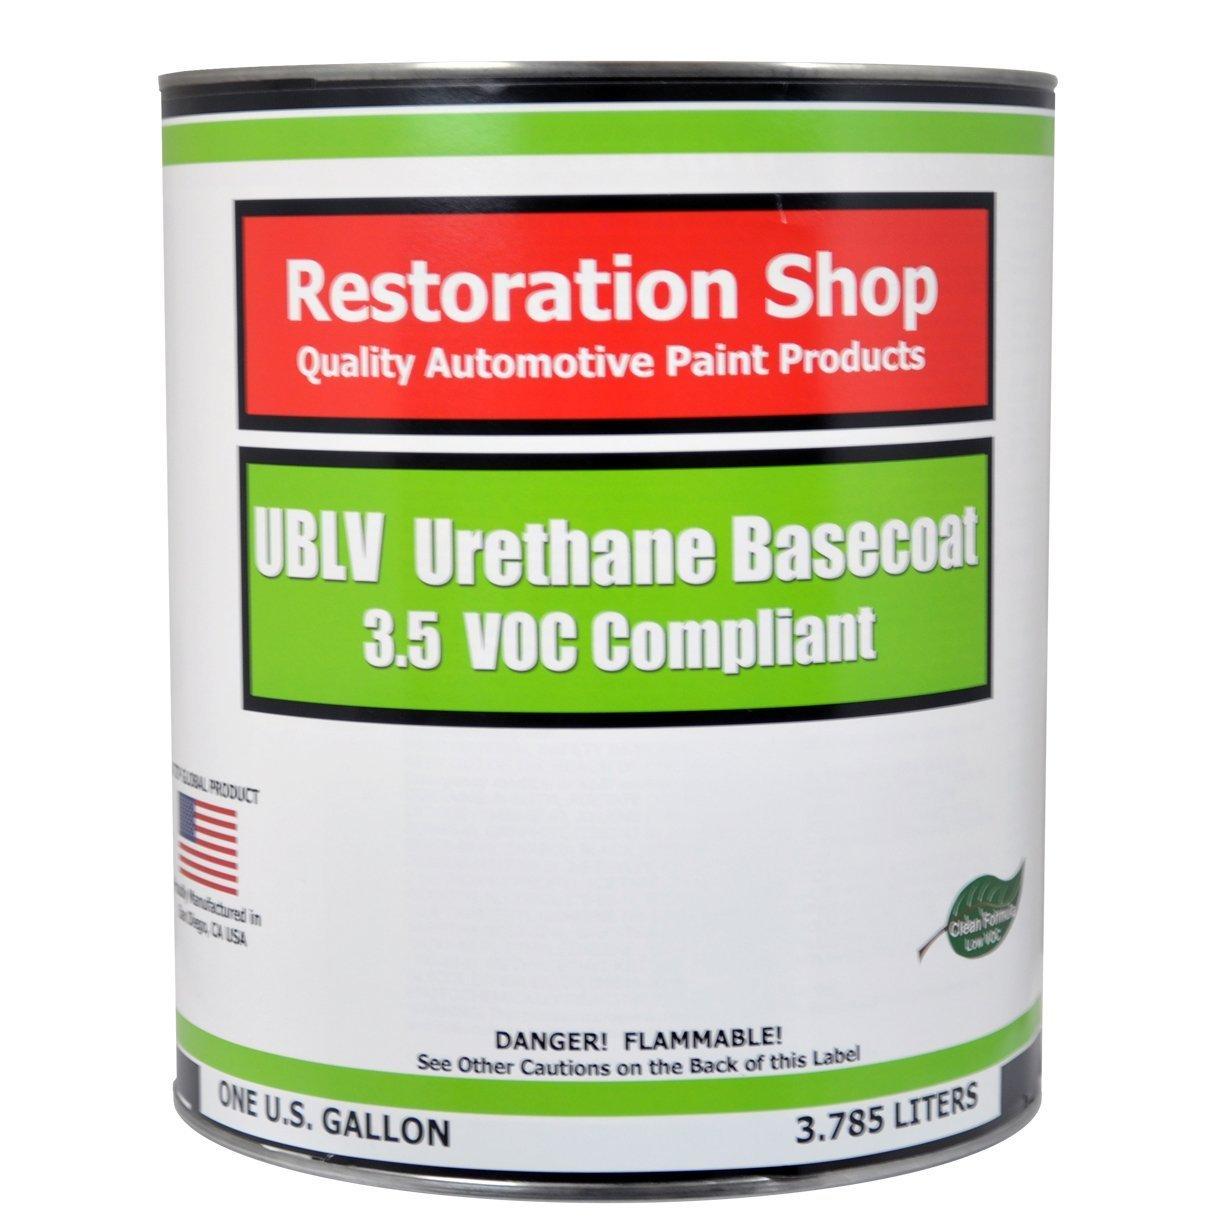 Restoration Shop - Gallon ONLY - TRACTOR RED Low Voc Urethane Basecoat Car Auto Paint